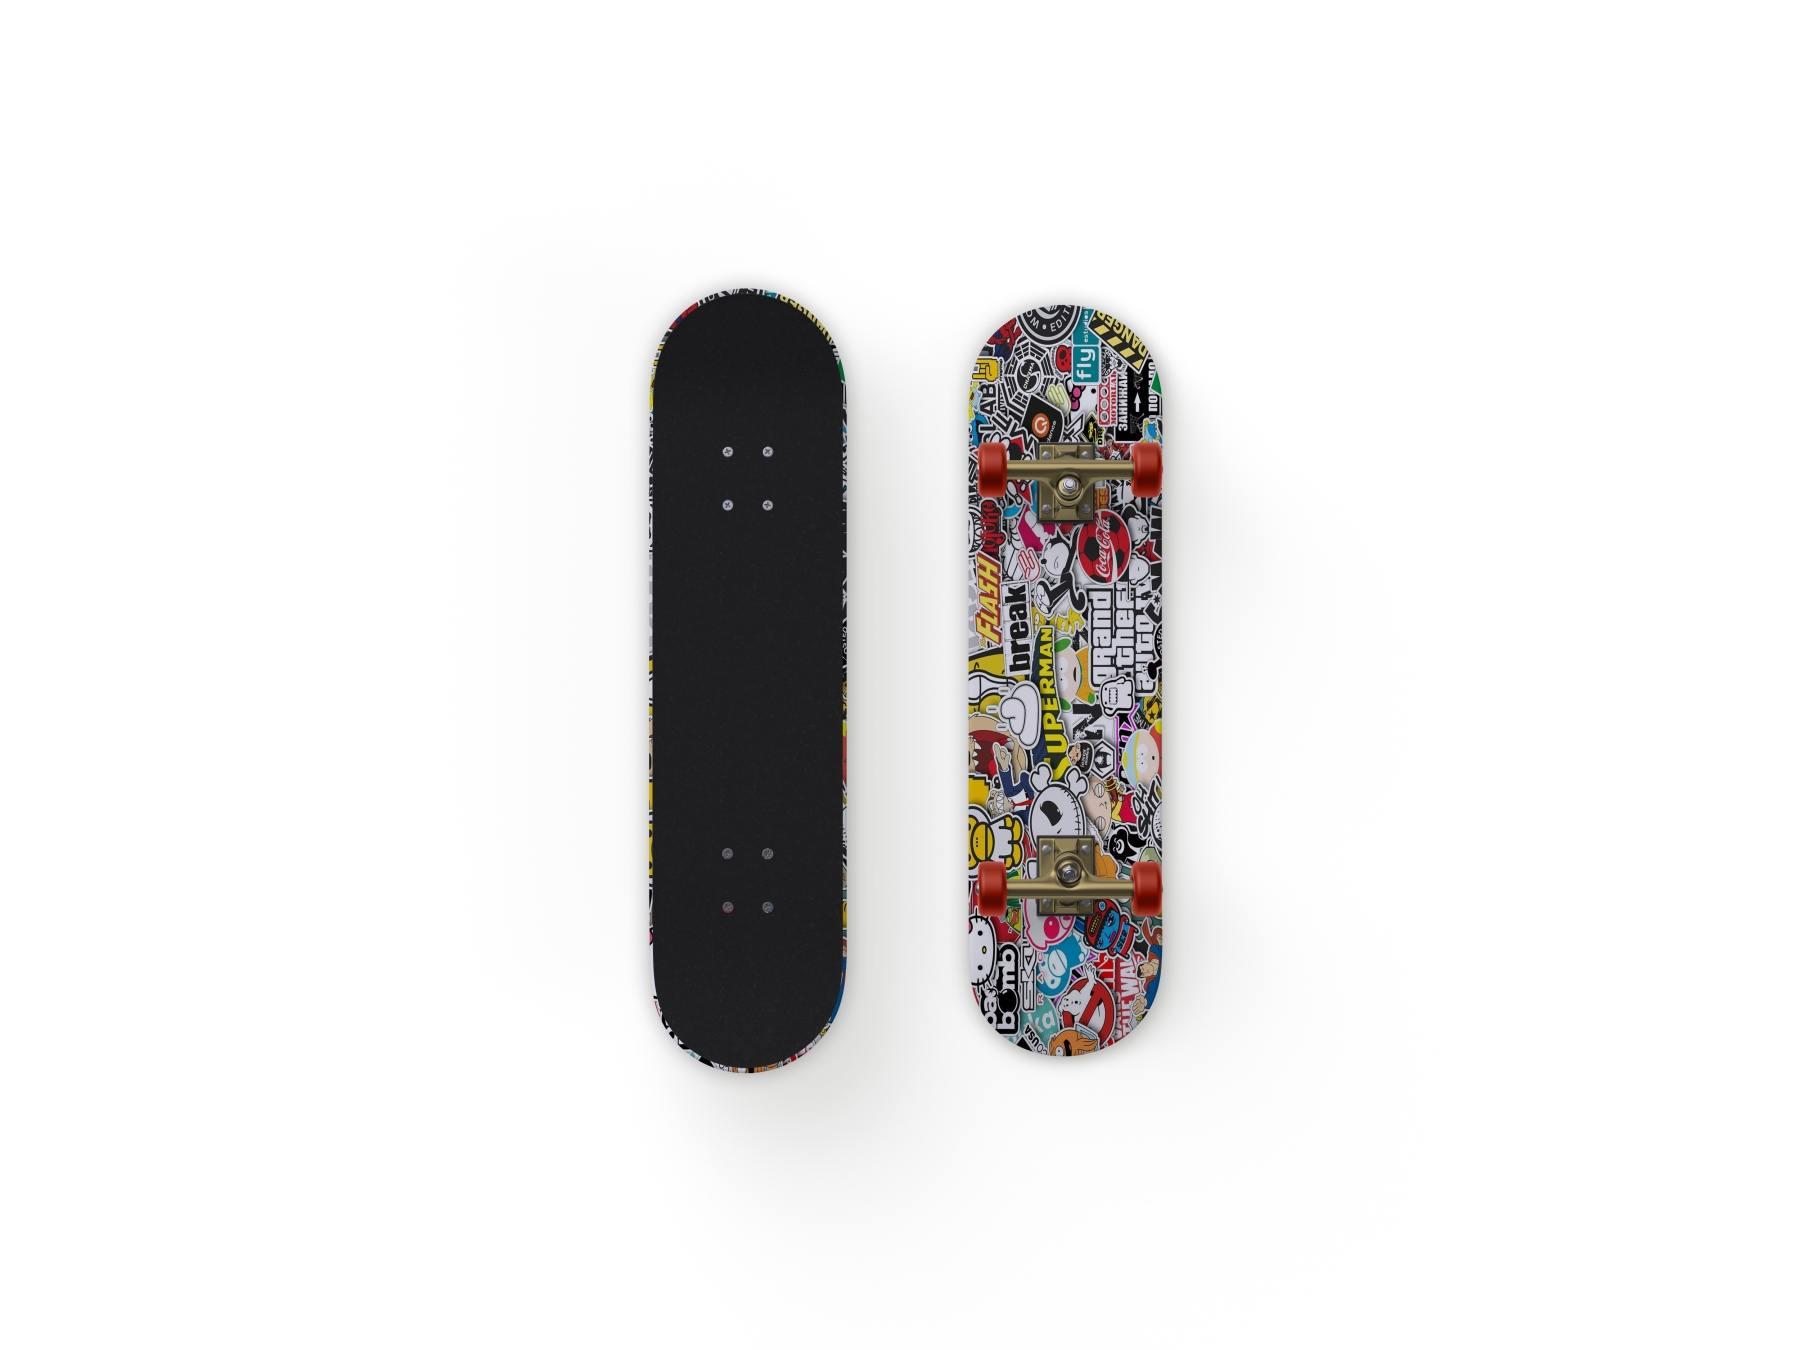 1569819307 39936c9b16a16fc - 潮流涂鸦滑板样机